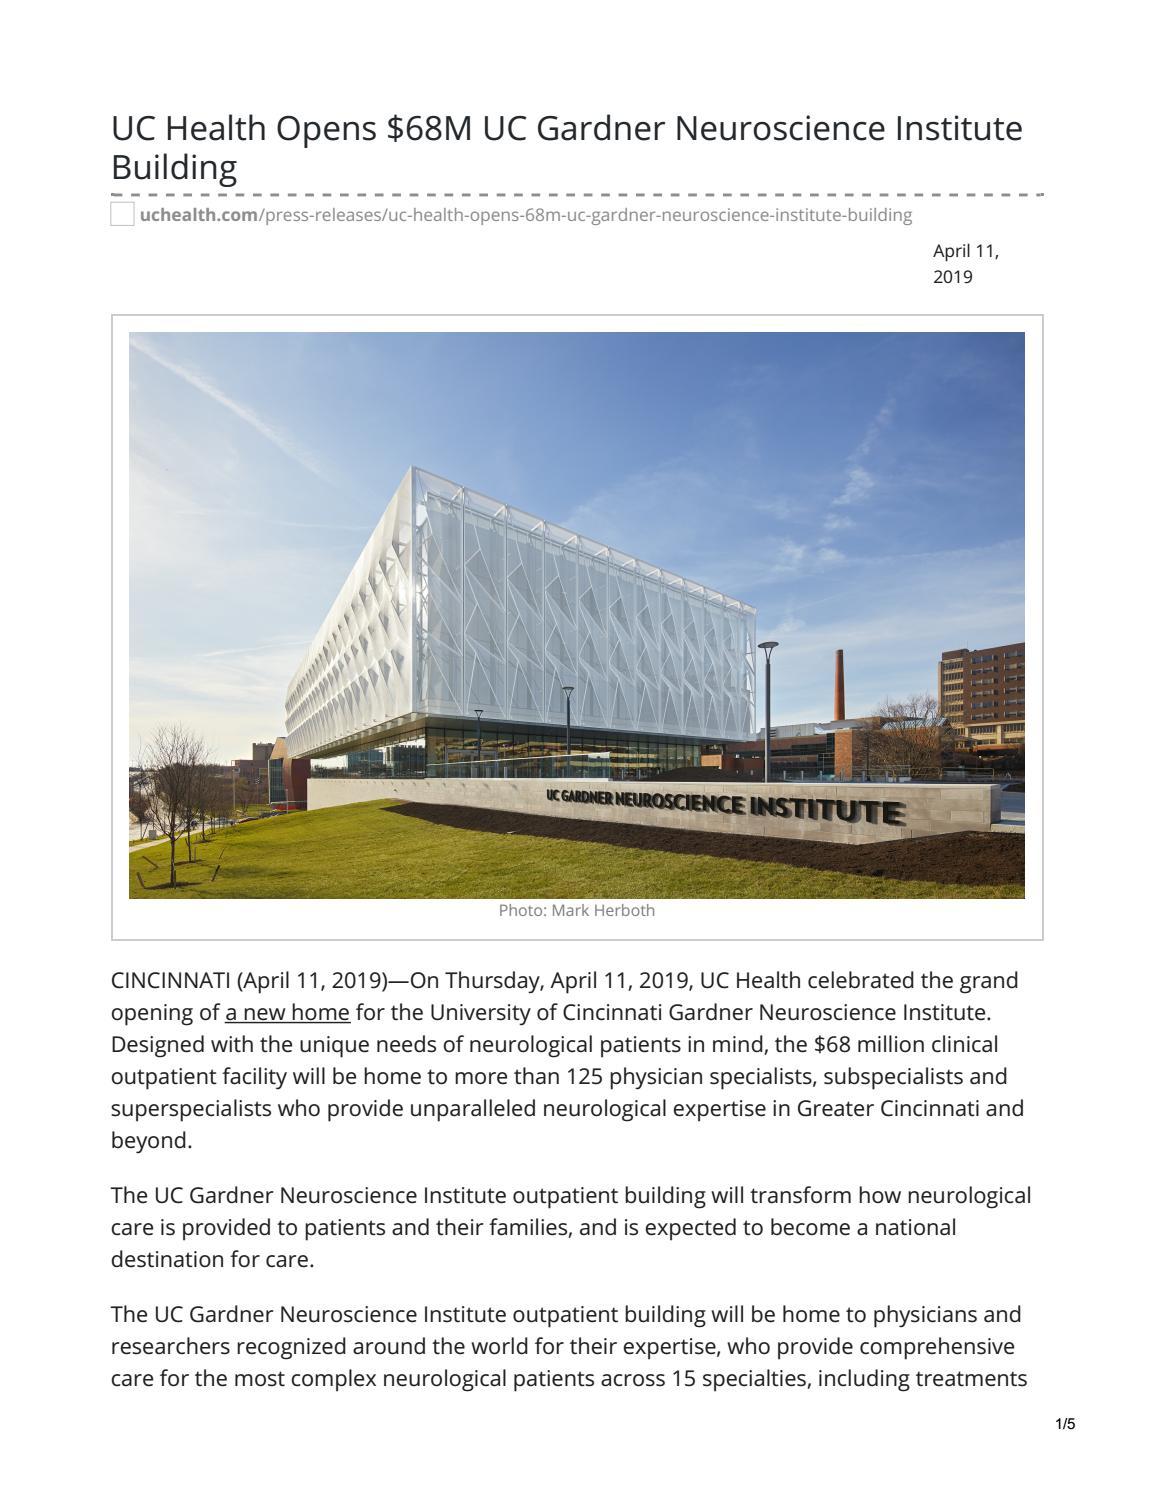 UC Health Gardner Neuroscience Institute Opens by